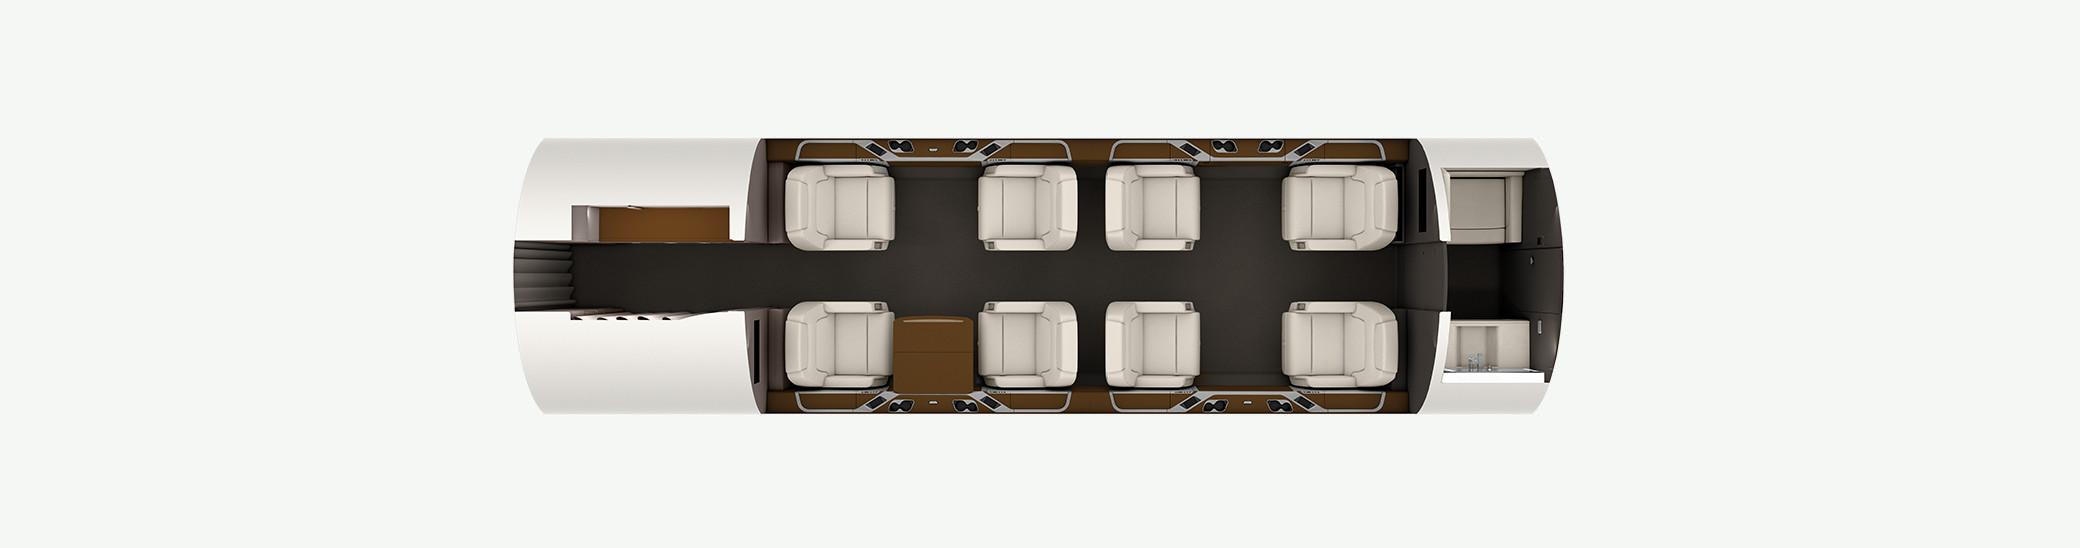 Floorplan_C350.jpg